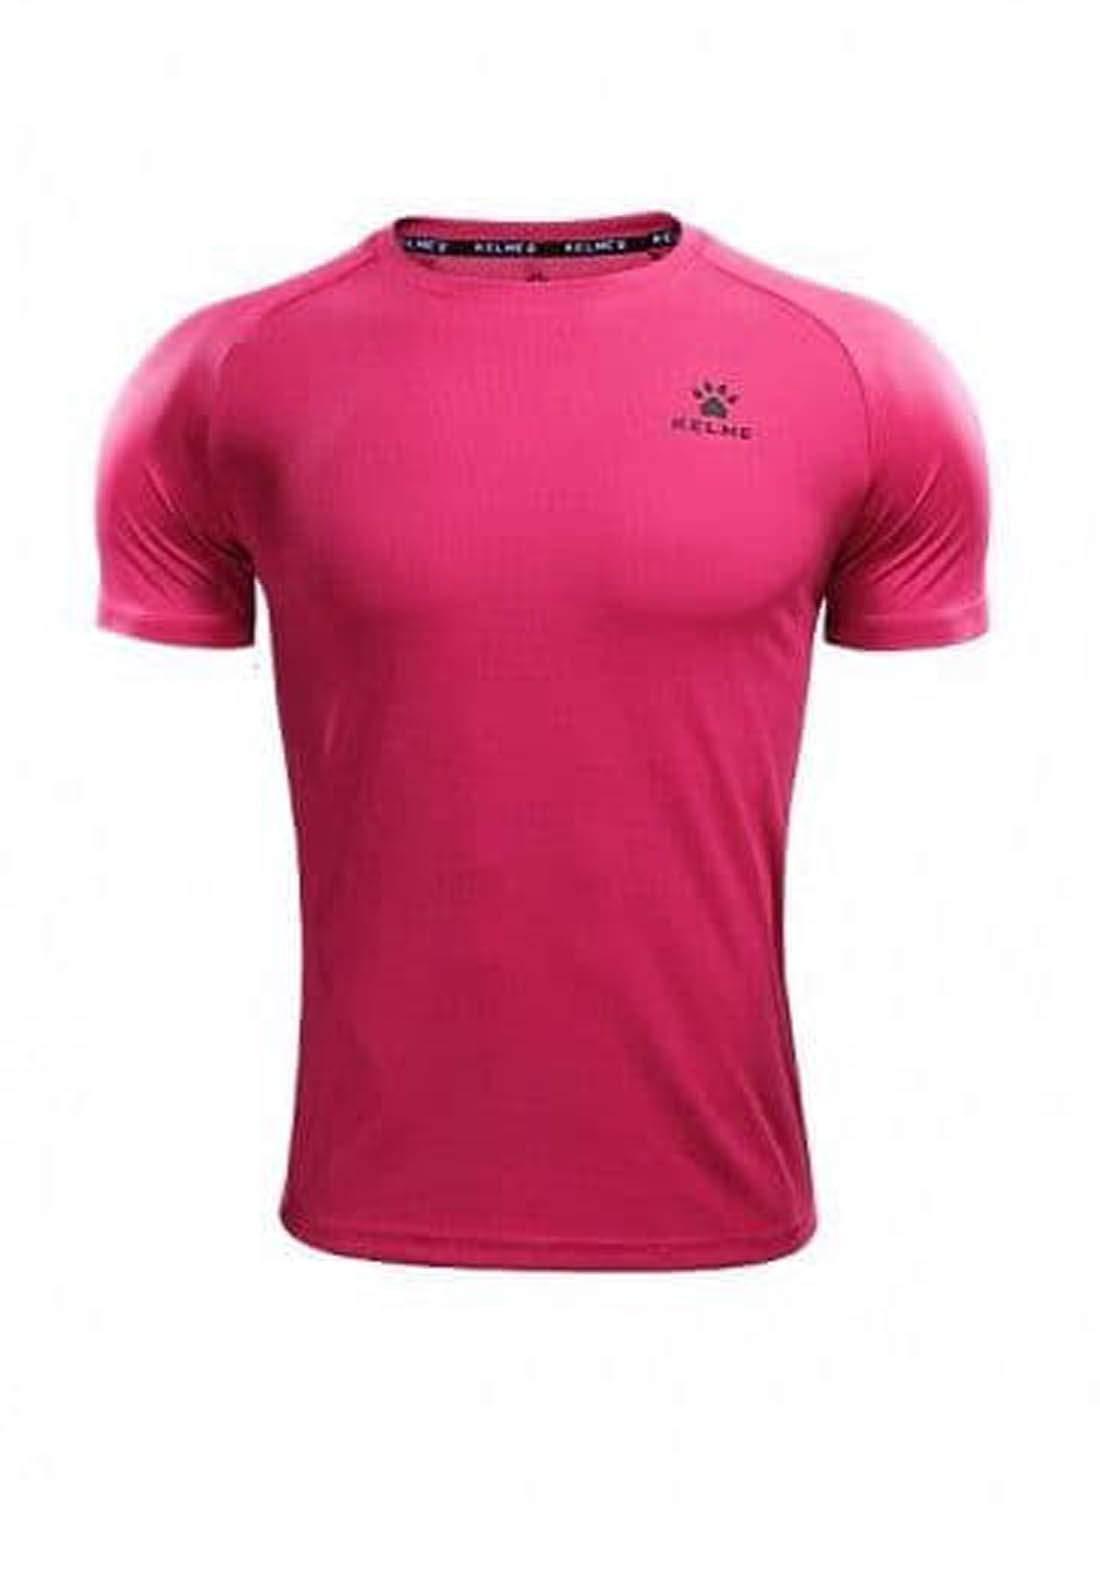 تيشيرت رياضي رجالي وردي اللون من Kelme